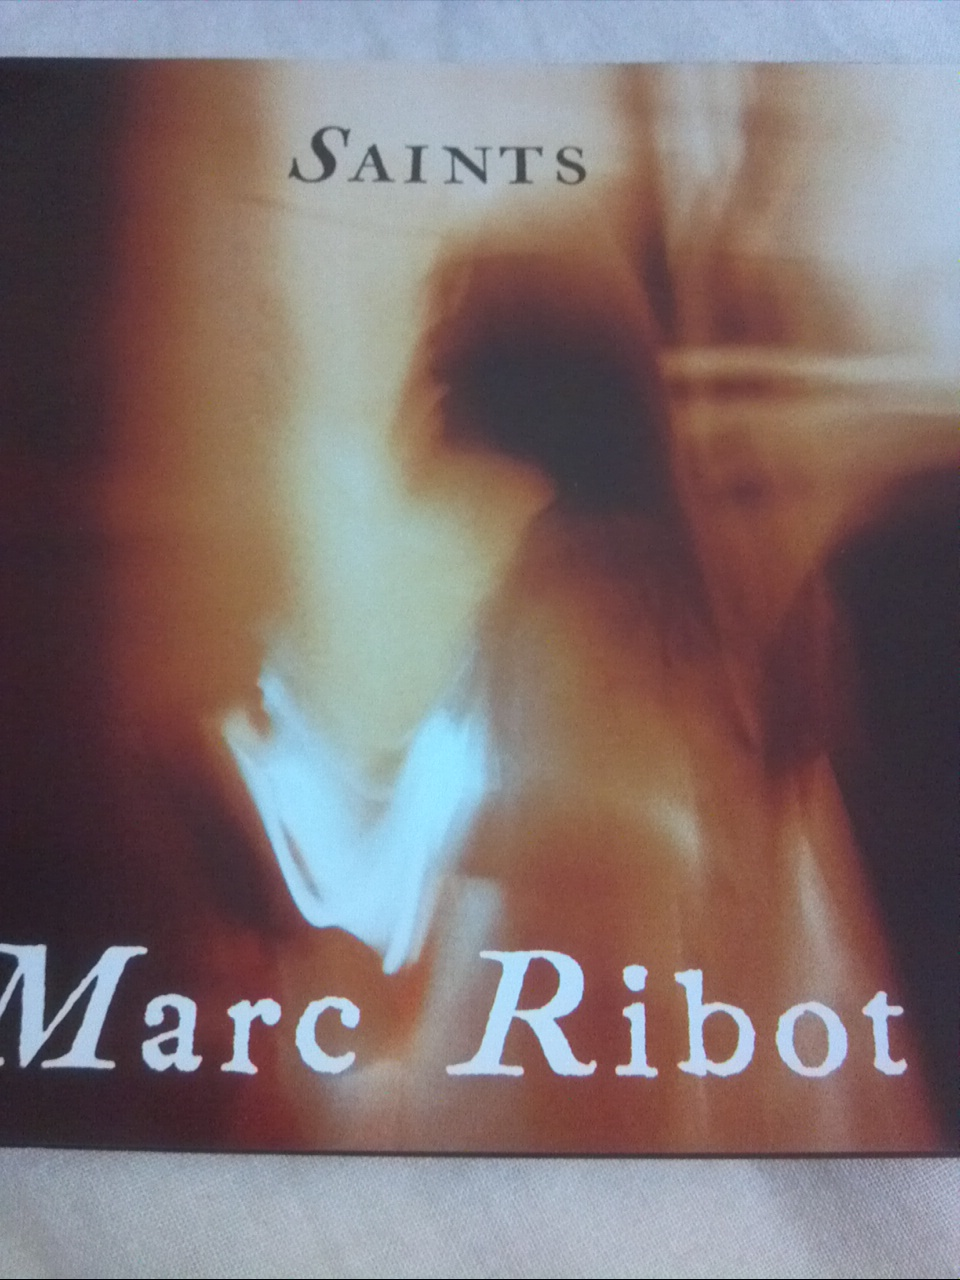 Marc Ribot;saints